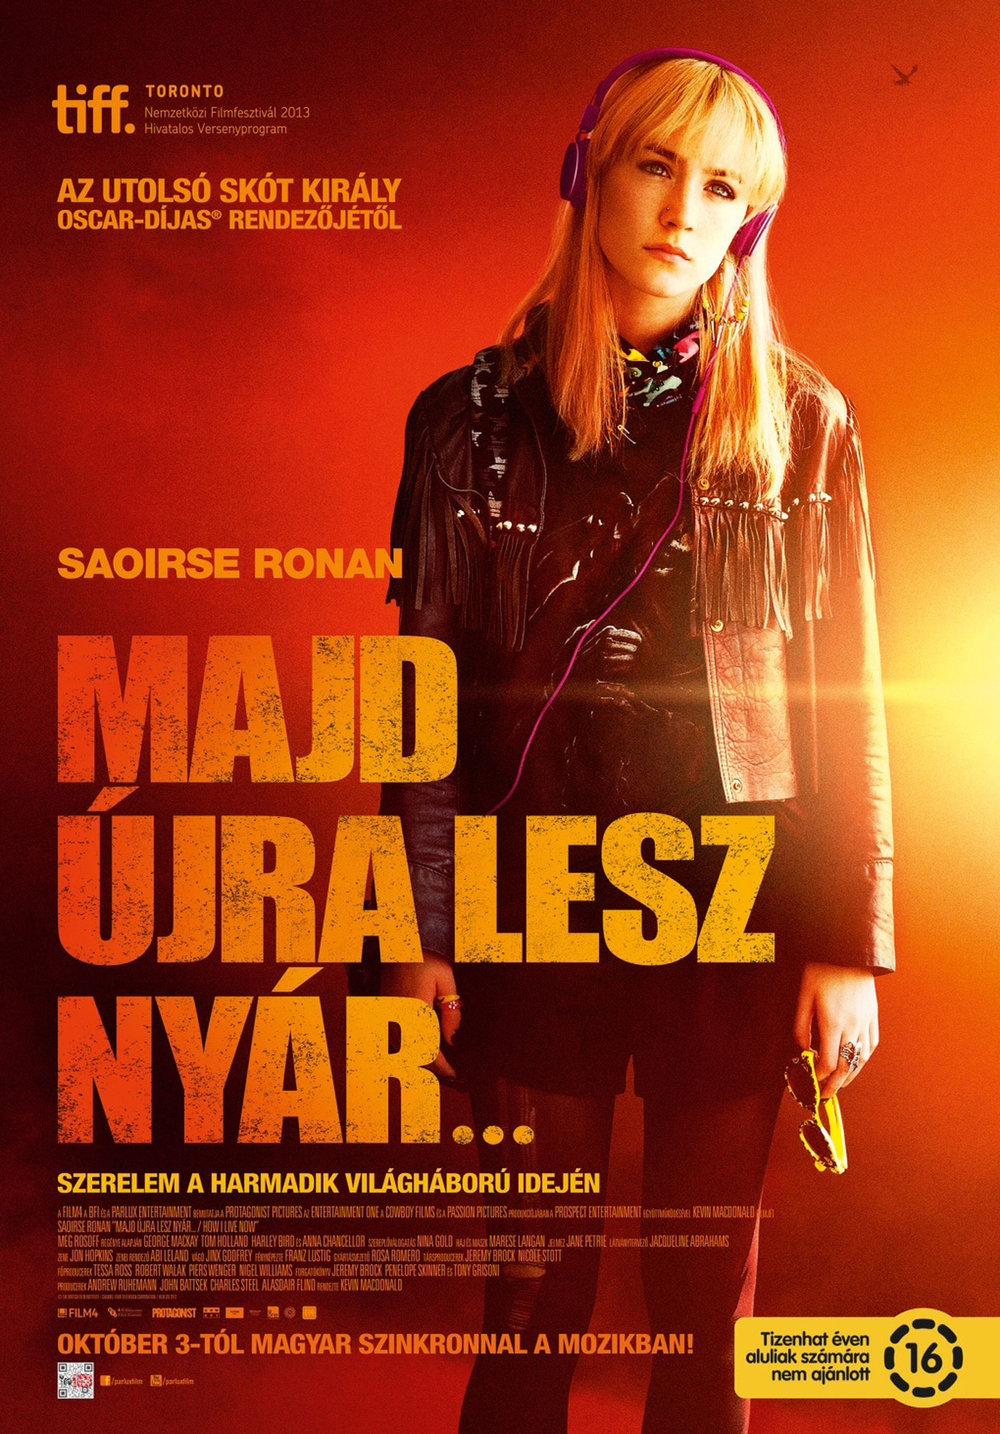 Meg-Rosoff---How-I-Live-Now-film---Majd-Ujra-Lesz-Nyar.jpg